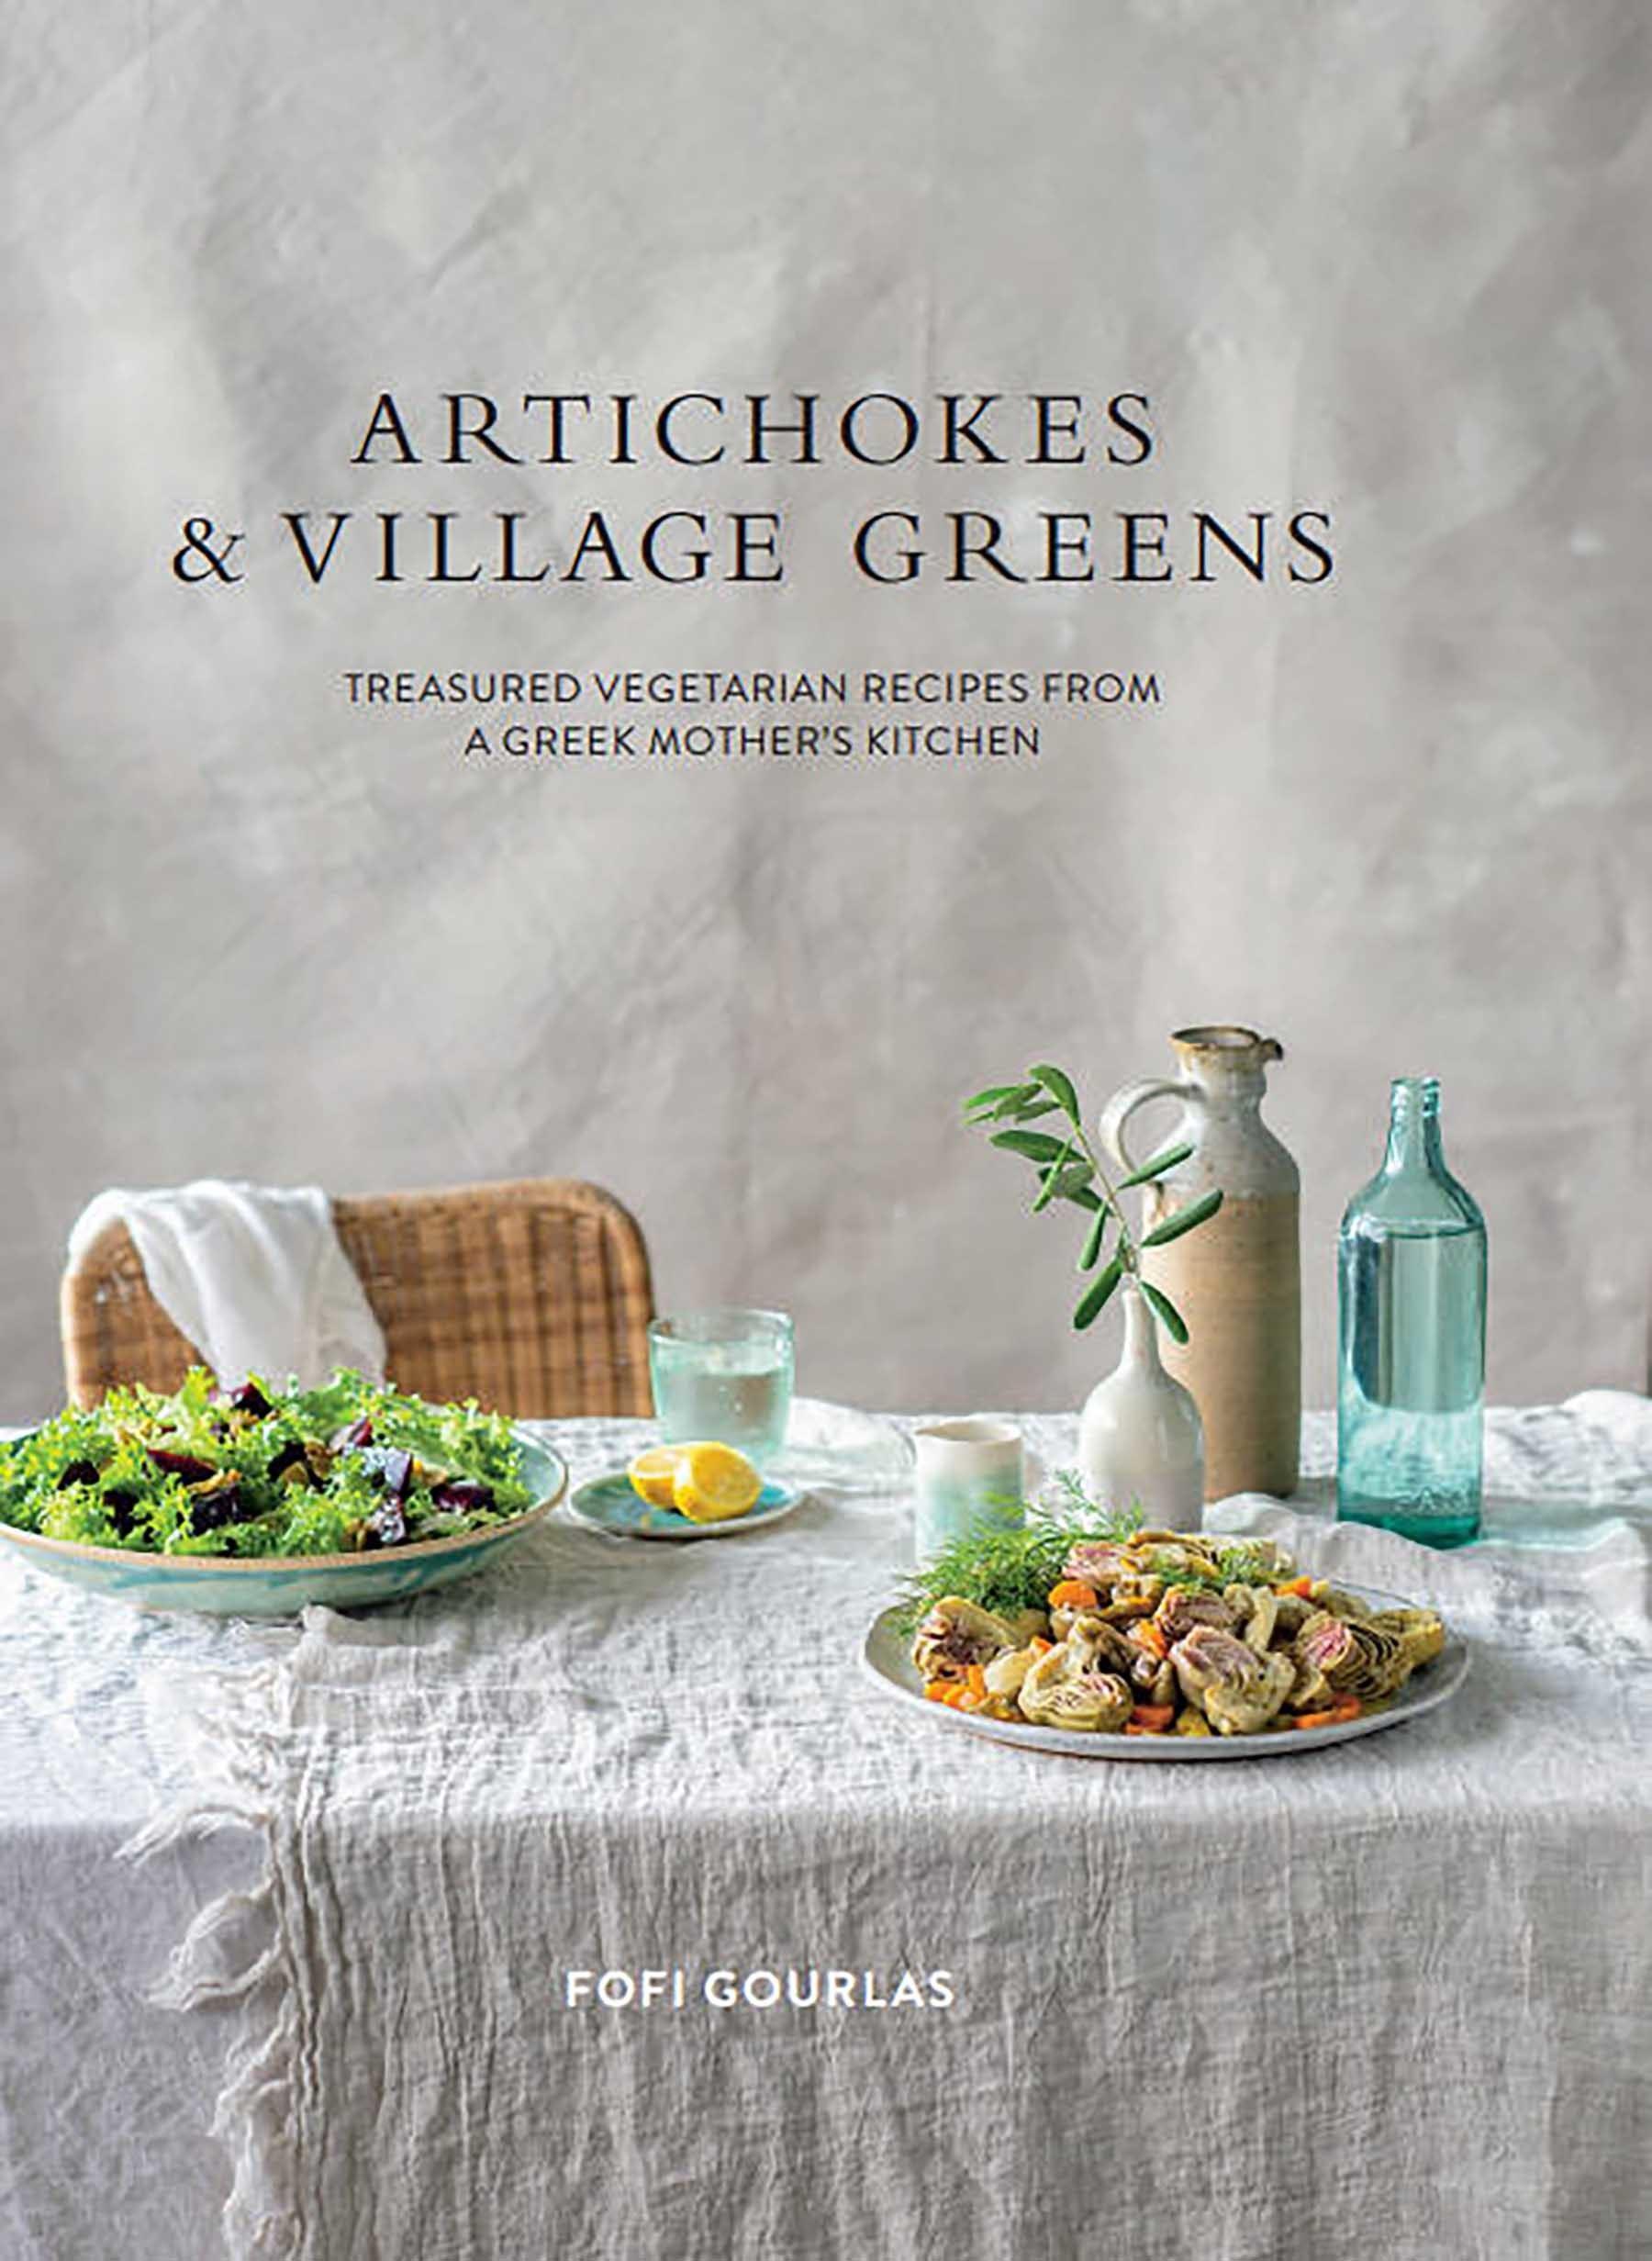 Artichokes and Village Greens